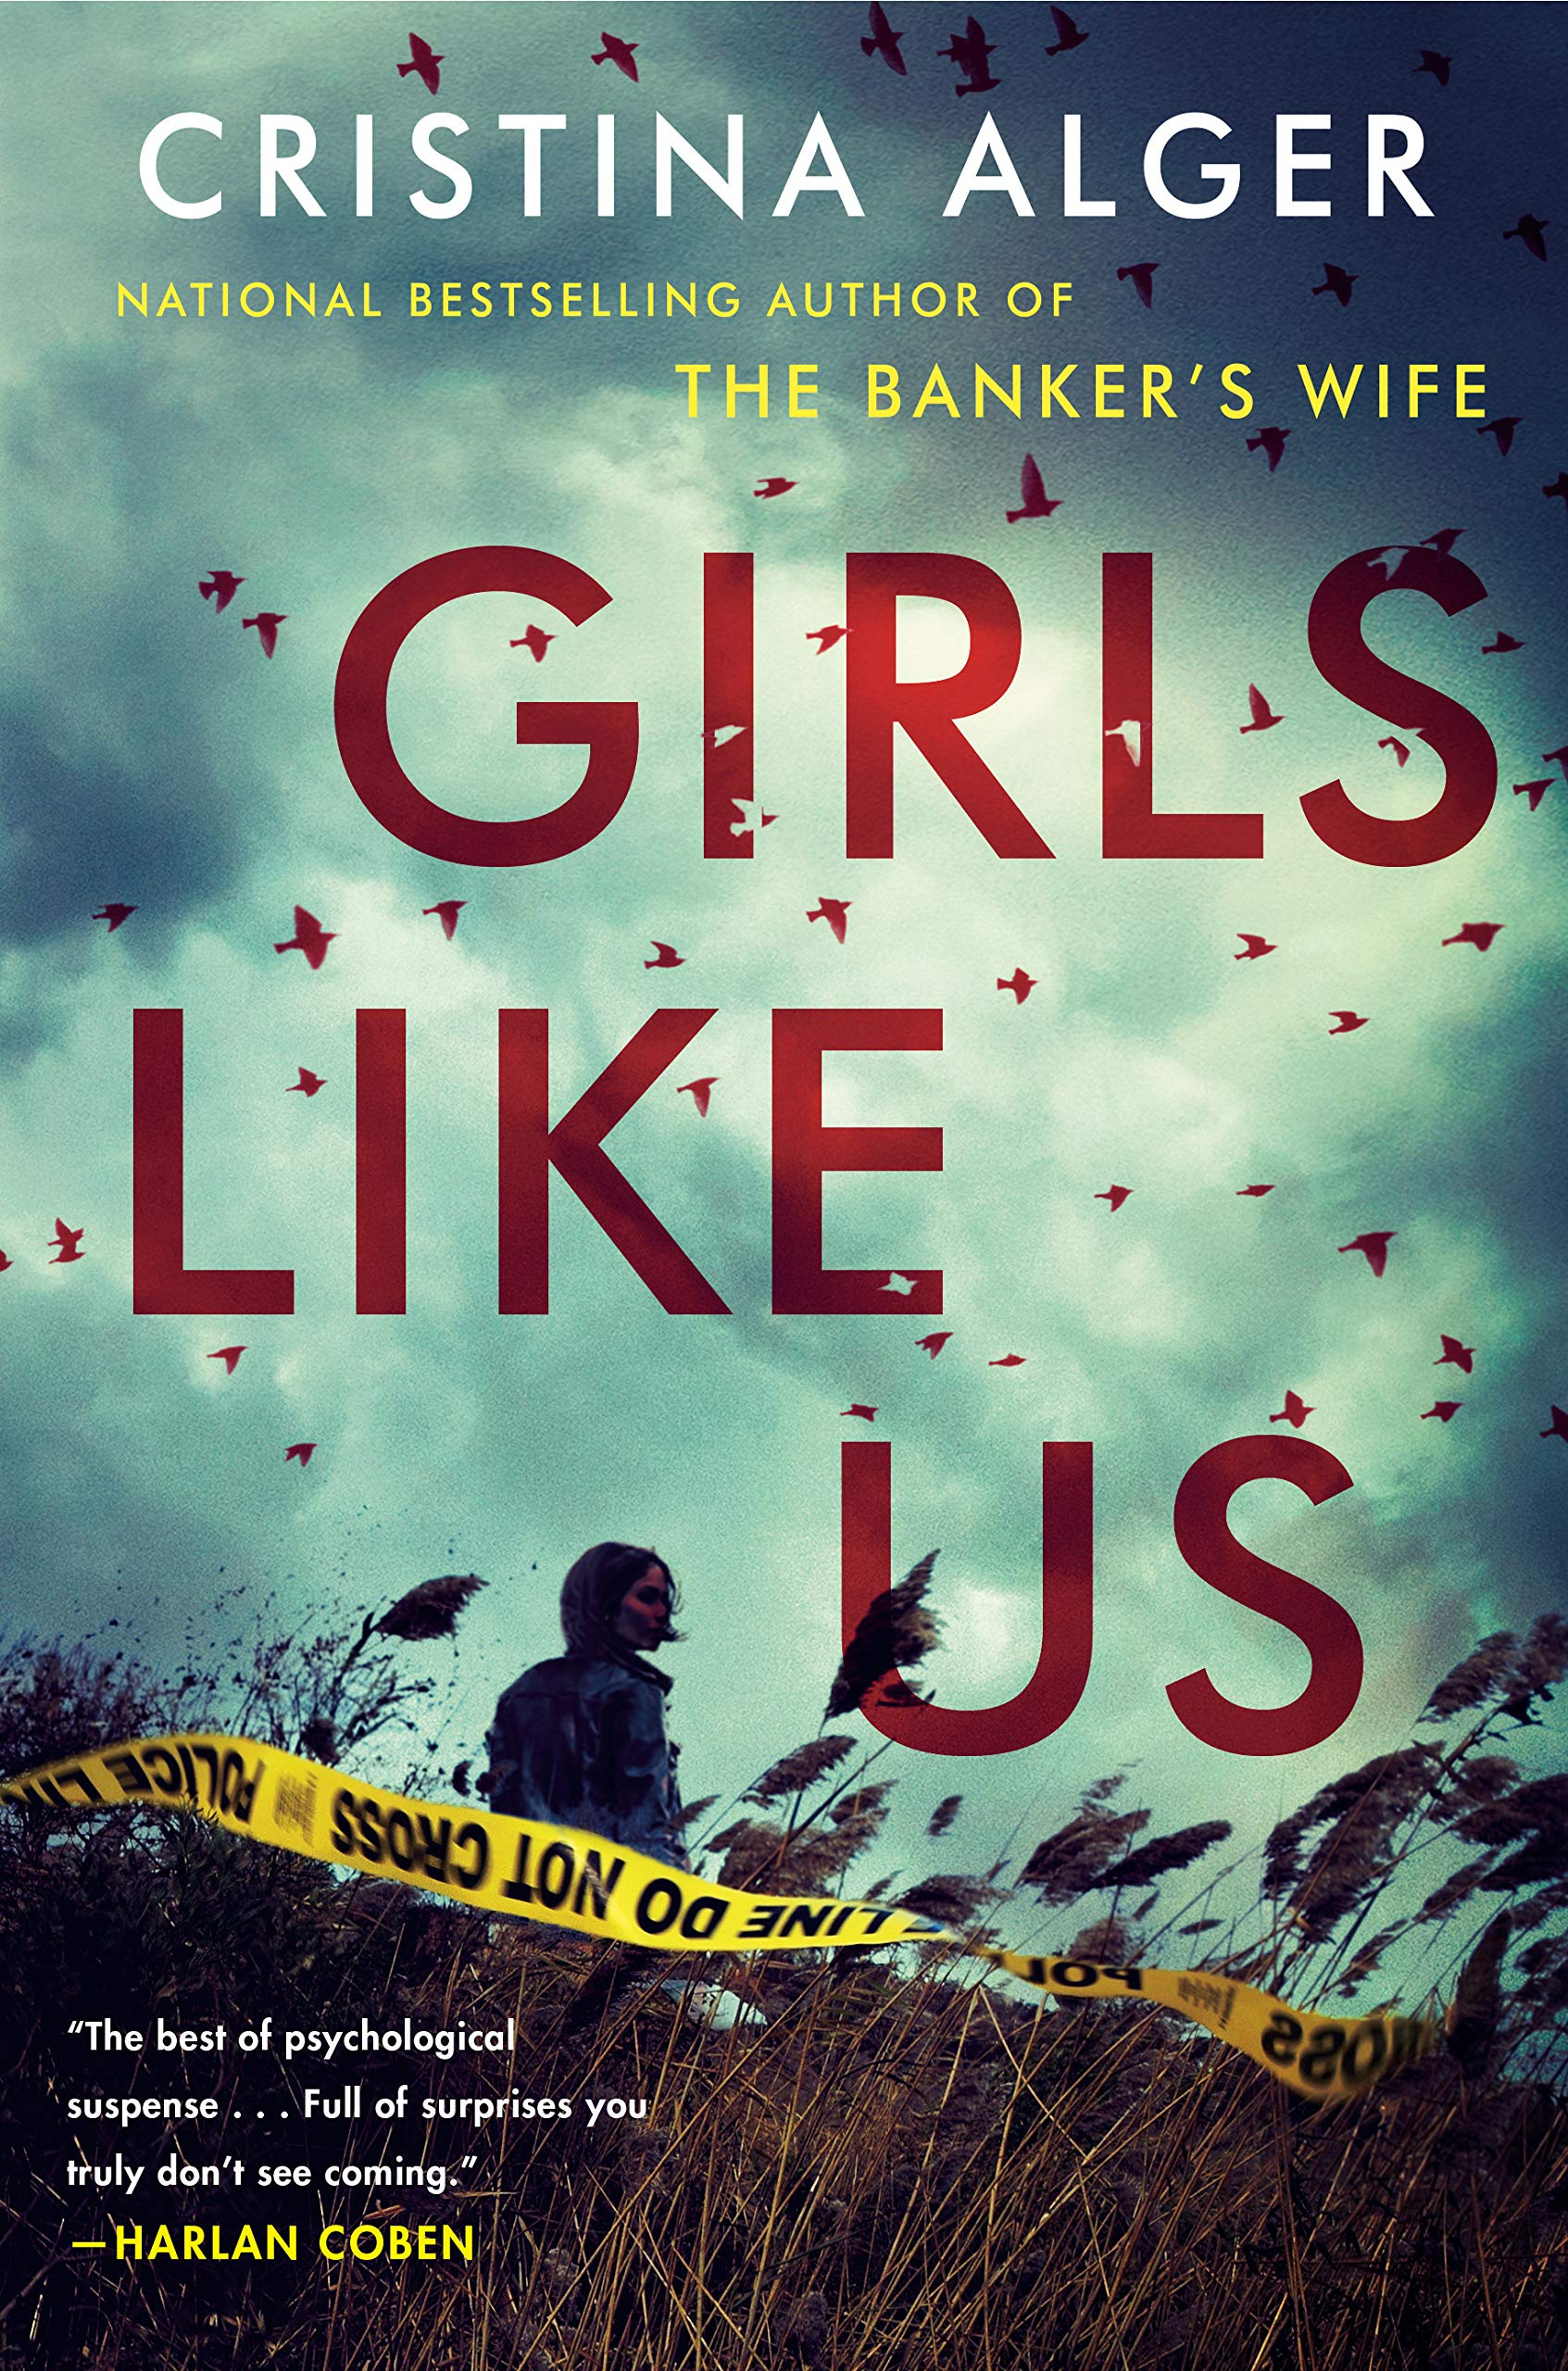 Amazon.com: Girls Like Us (9780525535805): Cristina Alger: Books